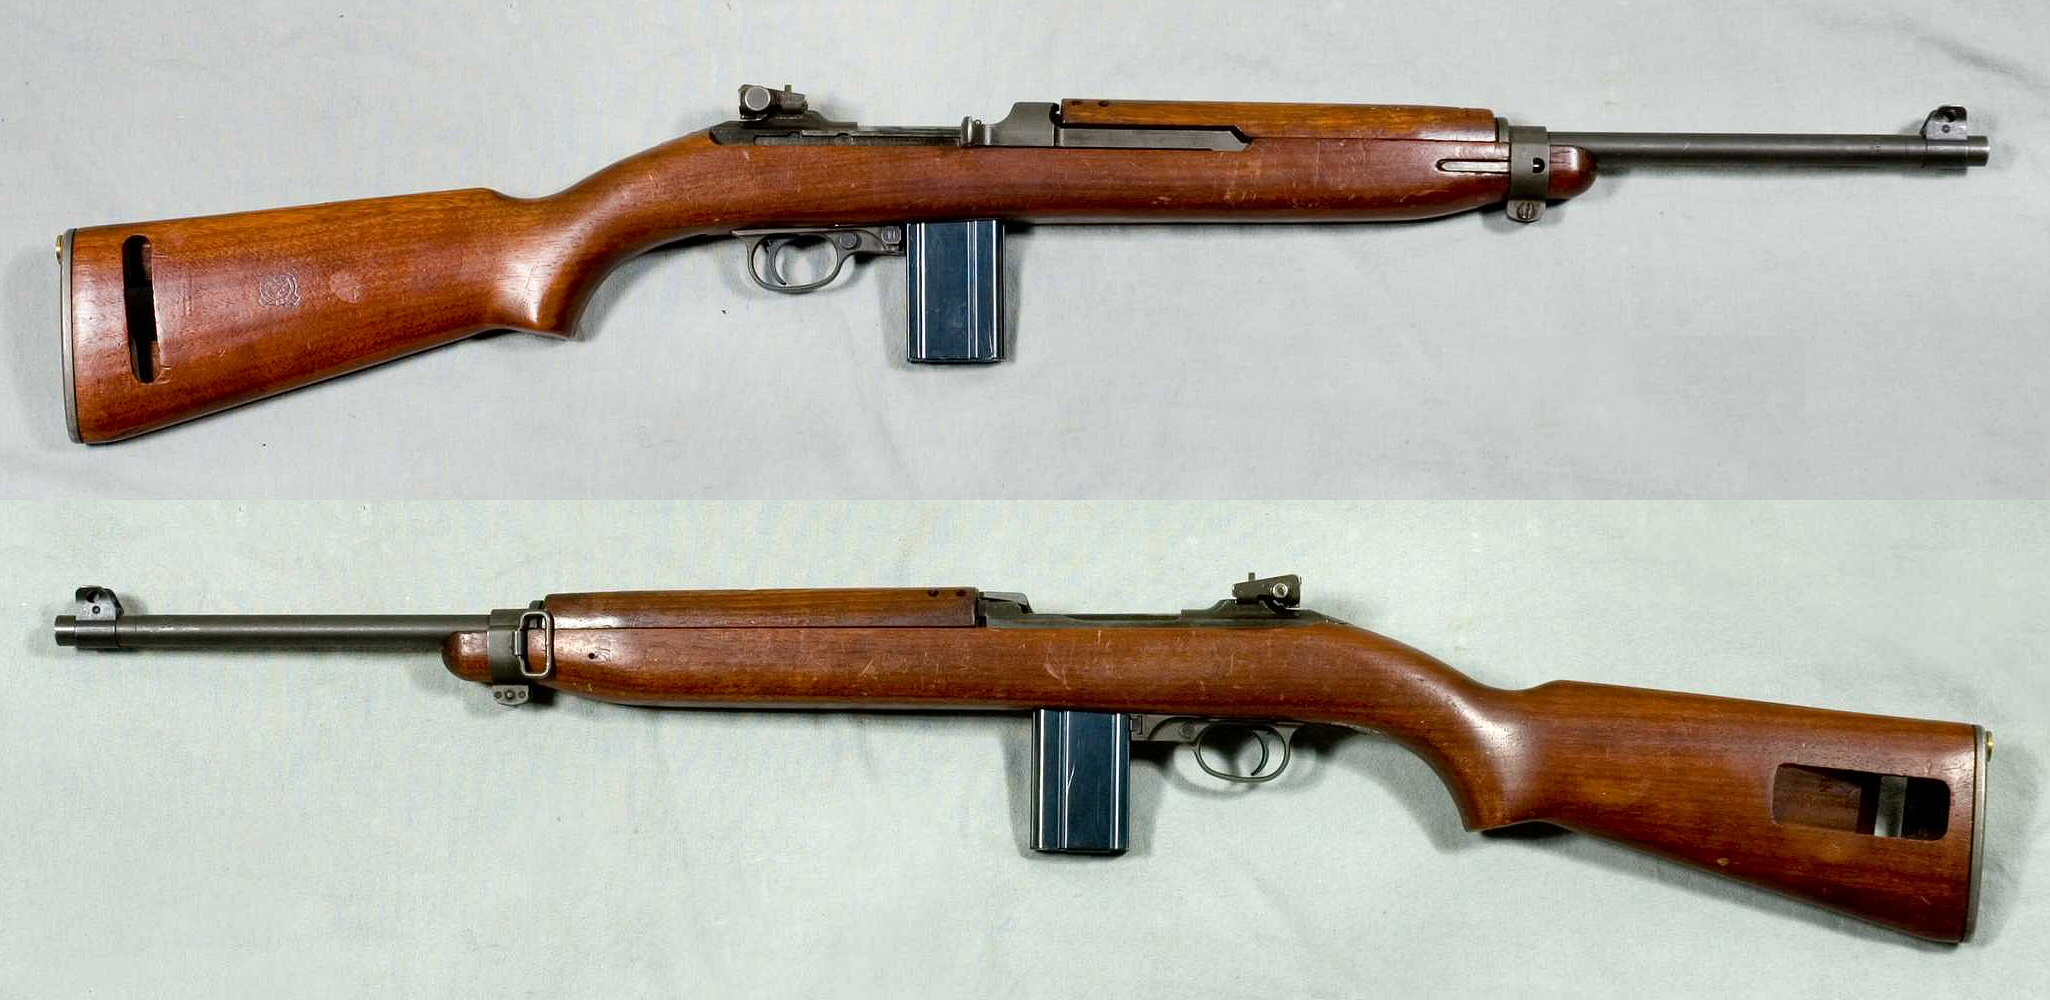 m1 rifle diagram sets in maths venn diagrams carbine wikipedia